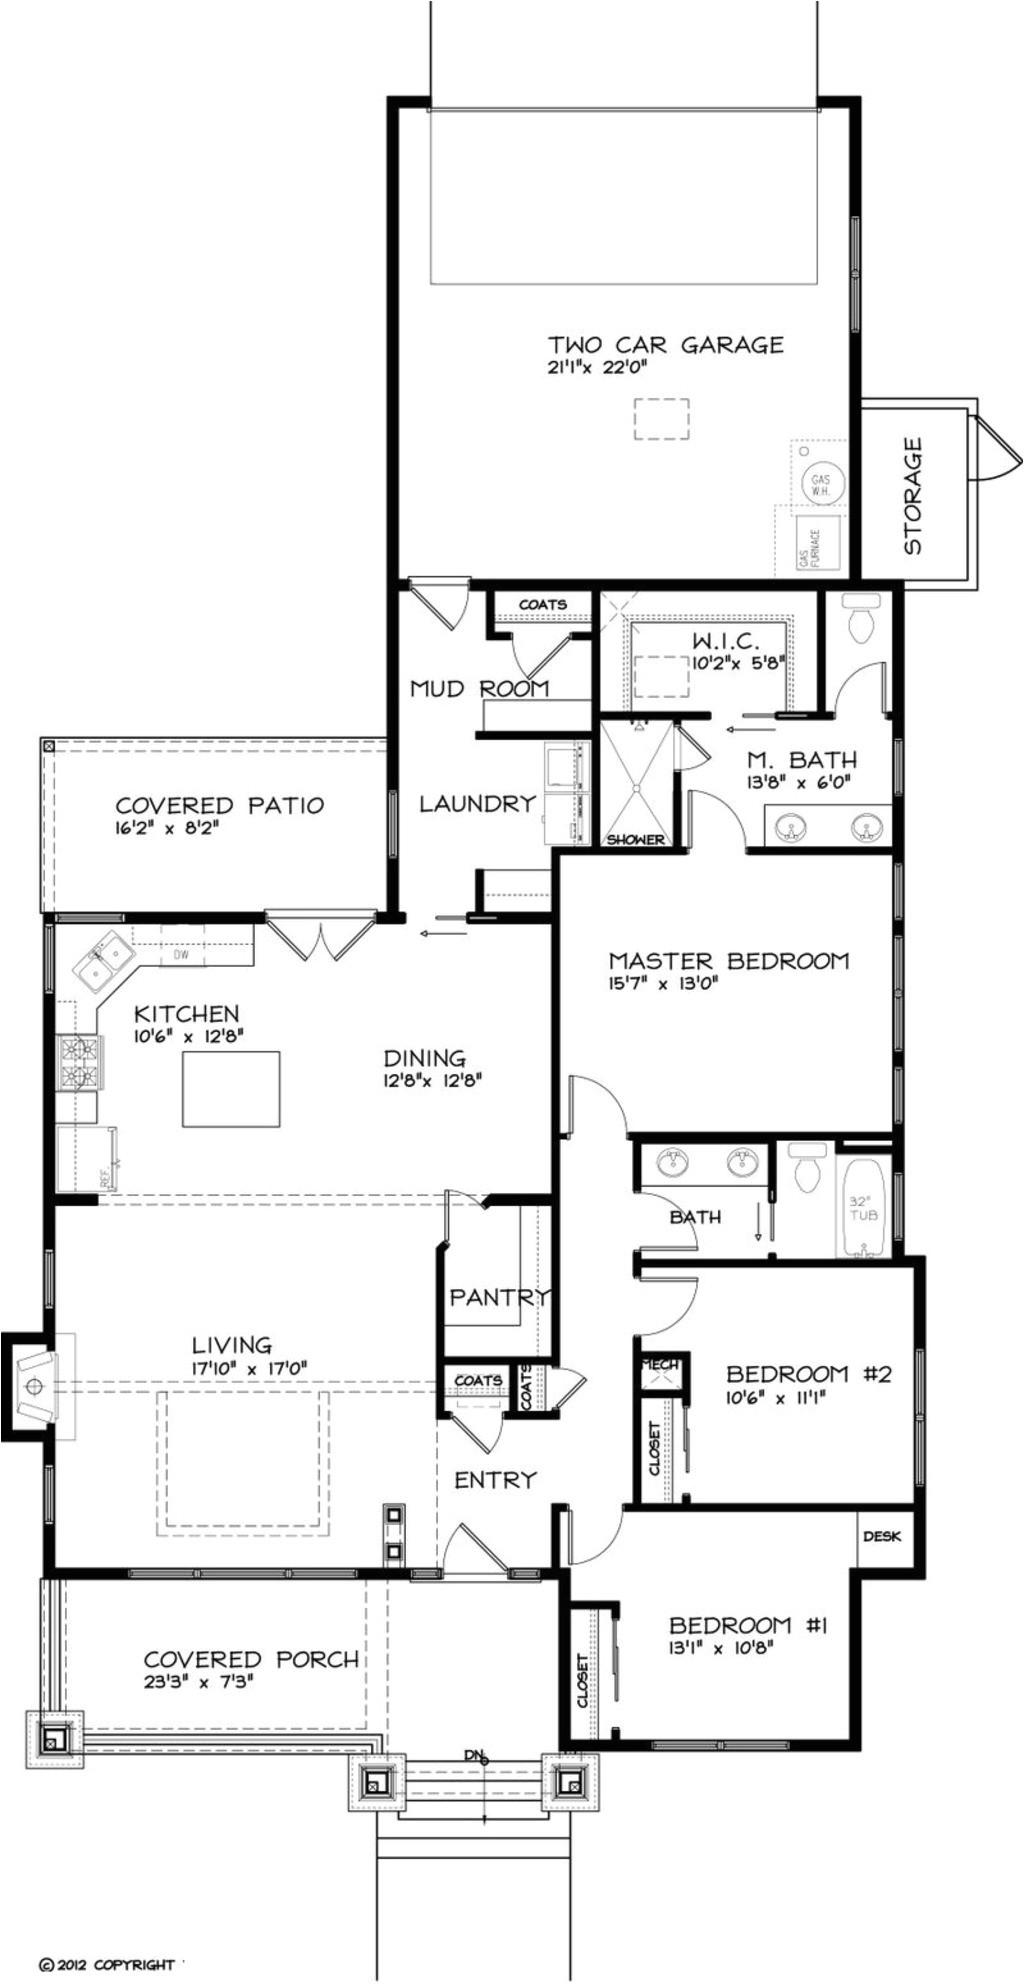 single story craftsman style house plans inspirational craftsman style house plan 3 beds 2 00 baths 1749 sq ft plan 434 17